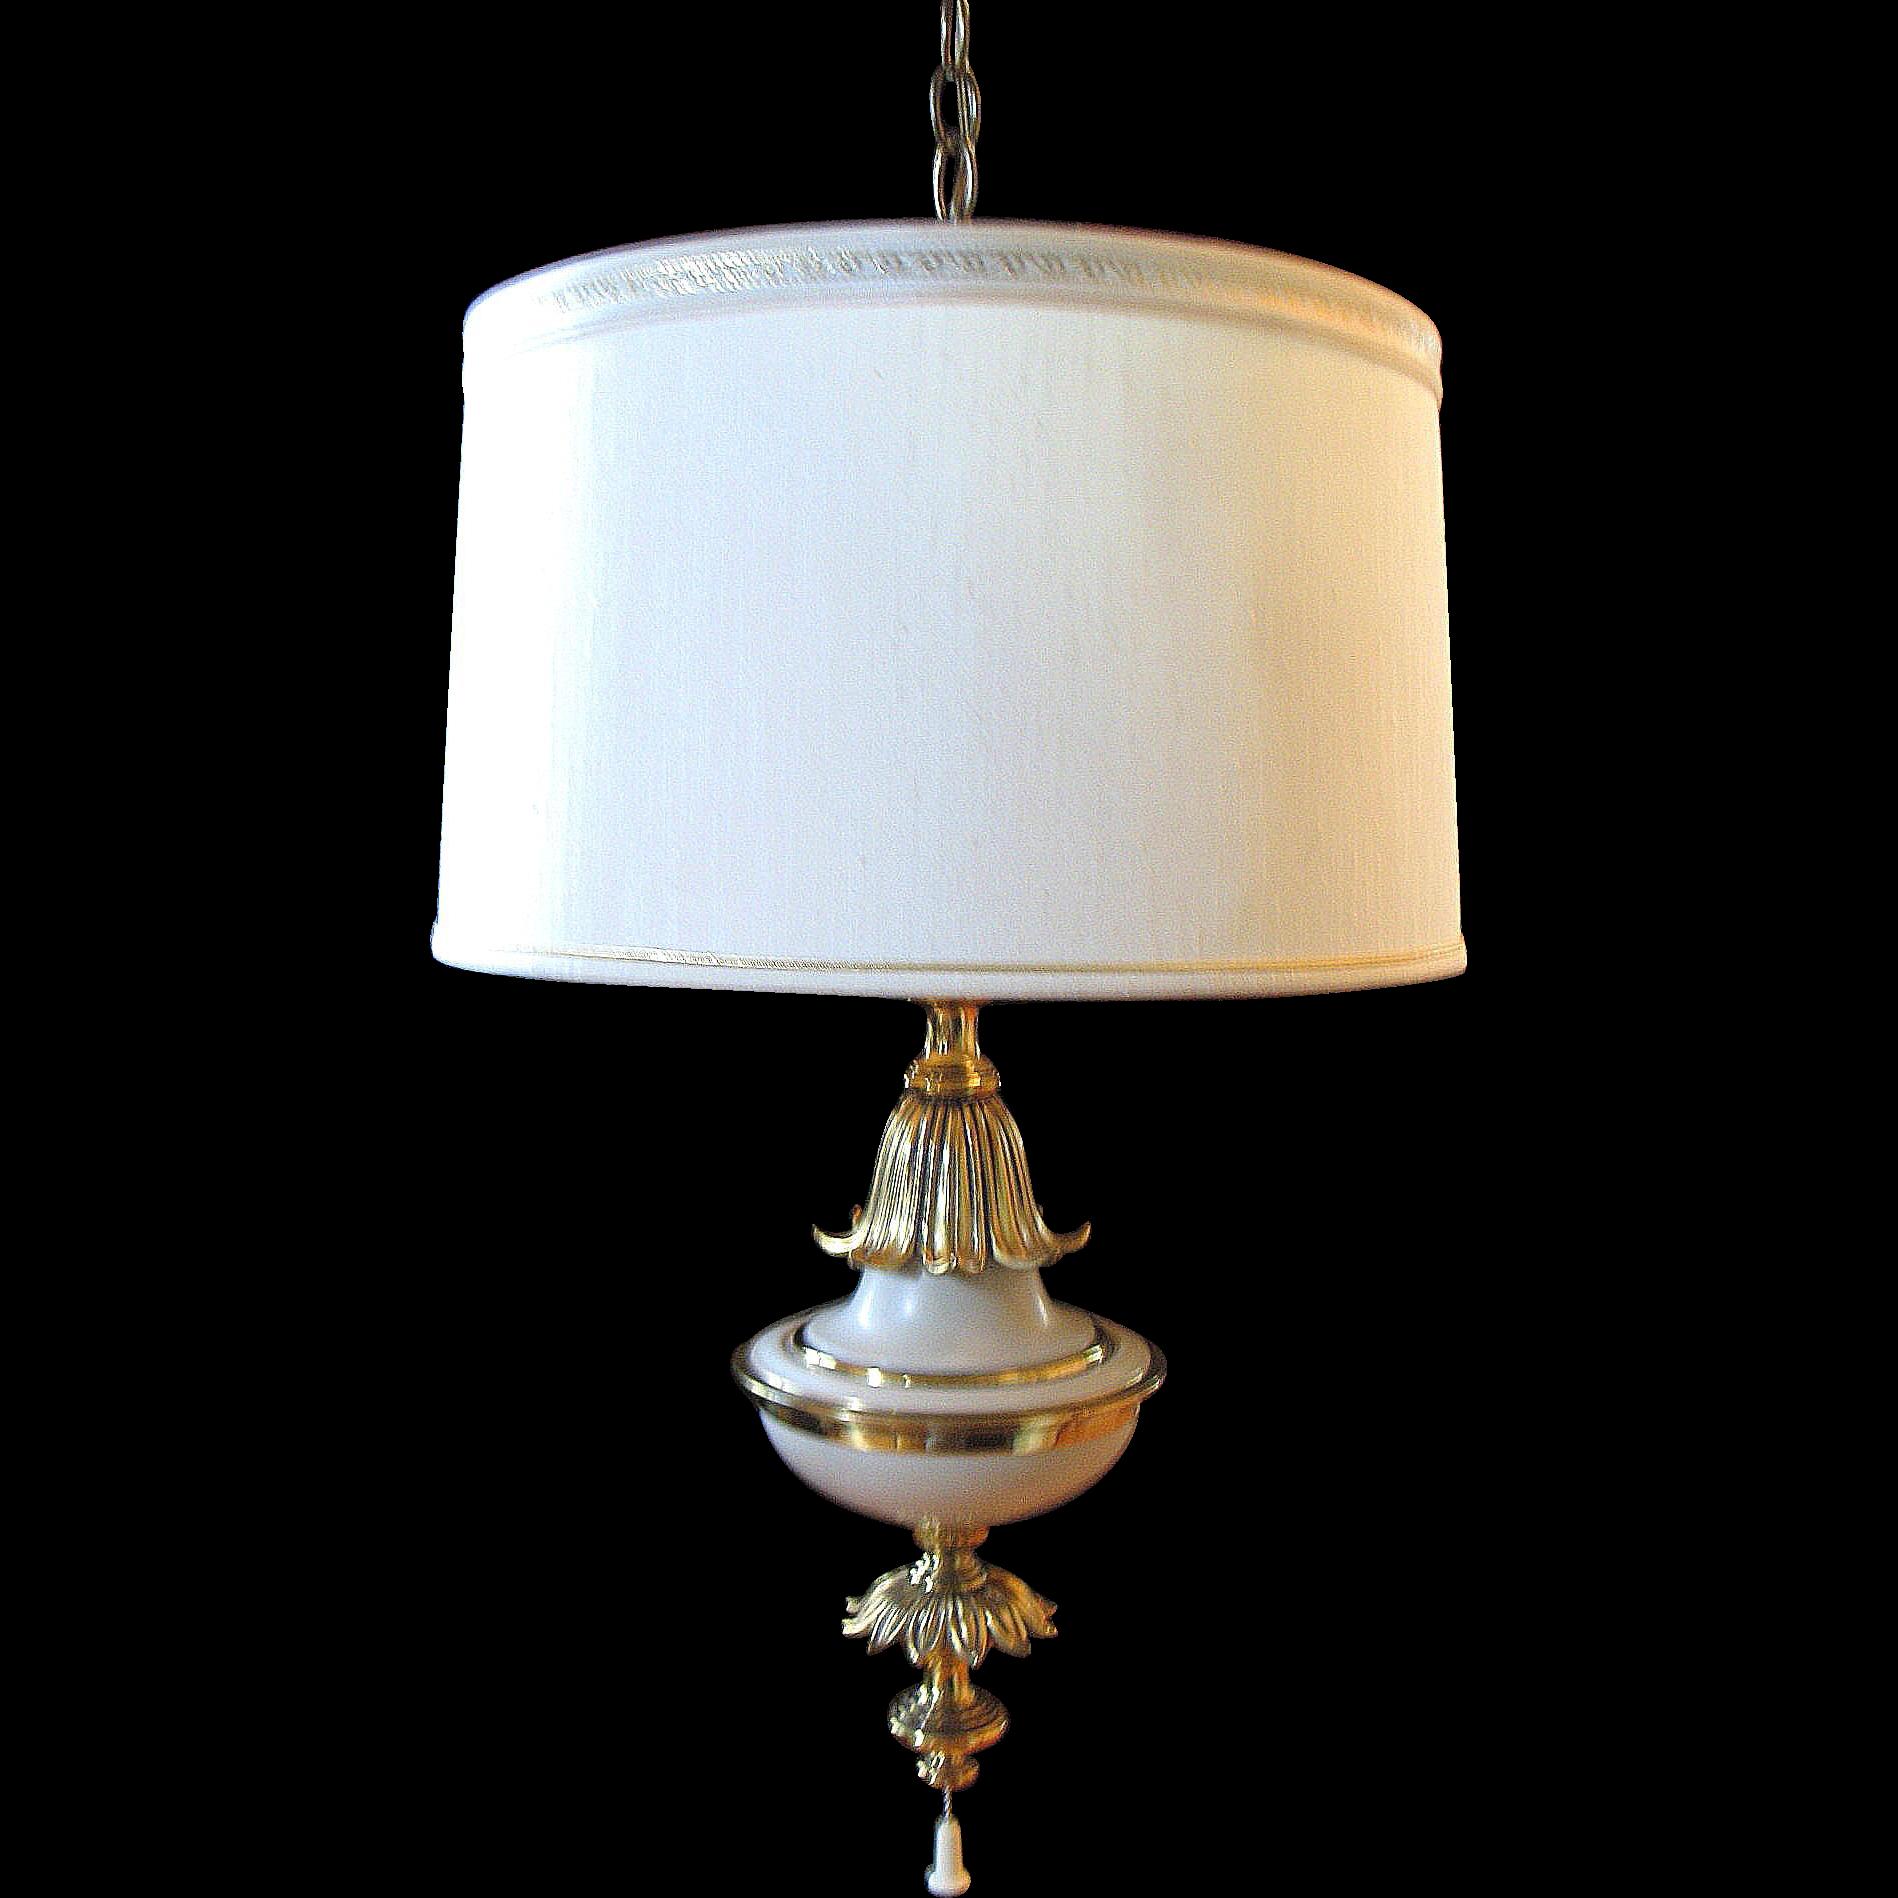 Vintage Stiffel Ceiling Lamp Light Fixture Hollywood Regency Brass